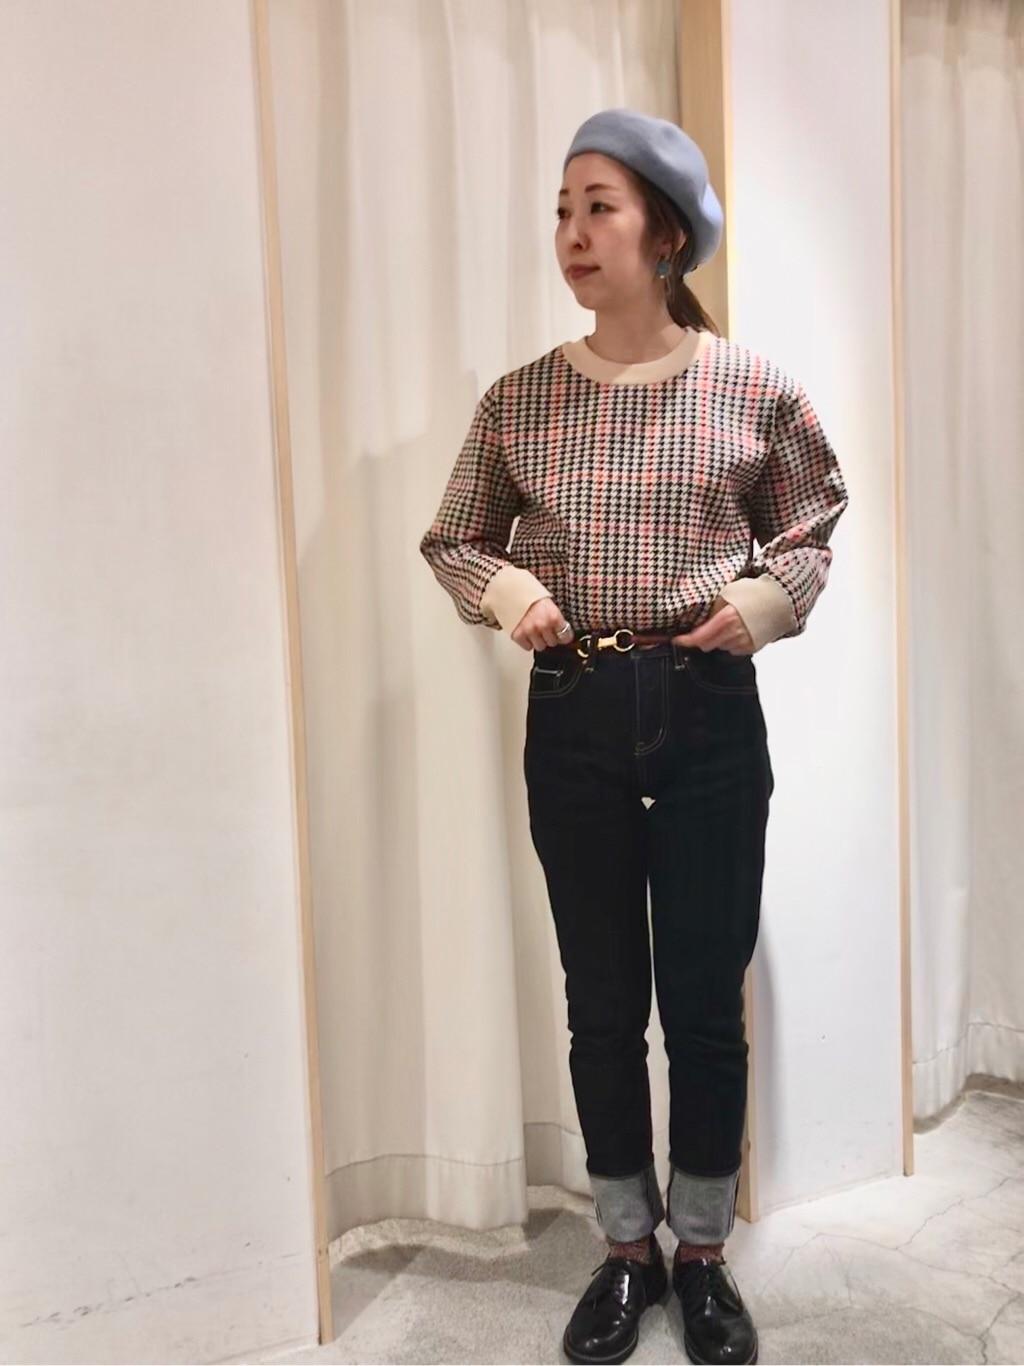 Dot and Stripes CHILD WOMAN ペリエ千葉 身長:155cm 2019.12.04